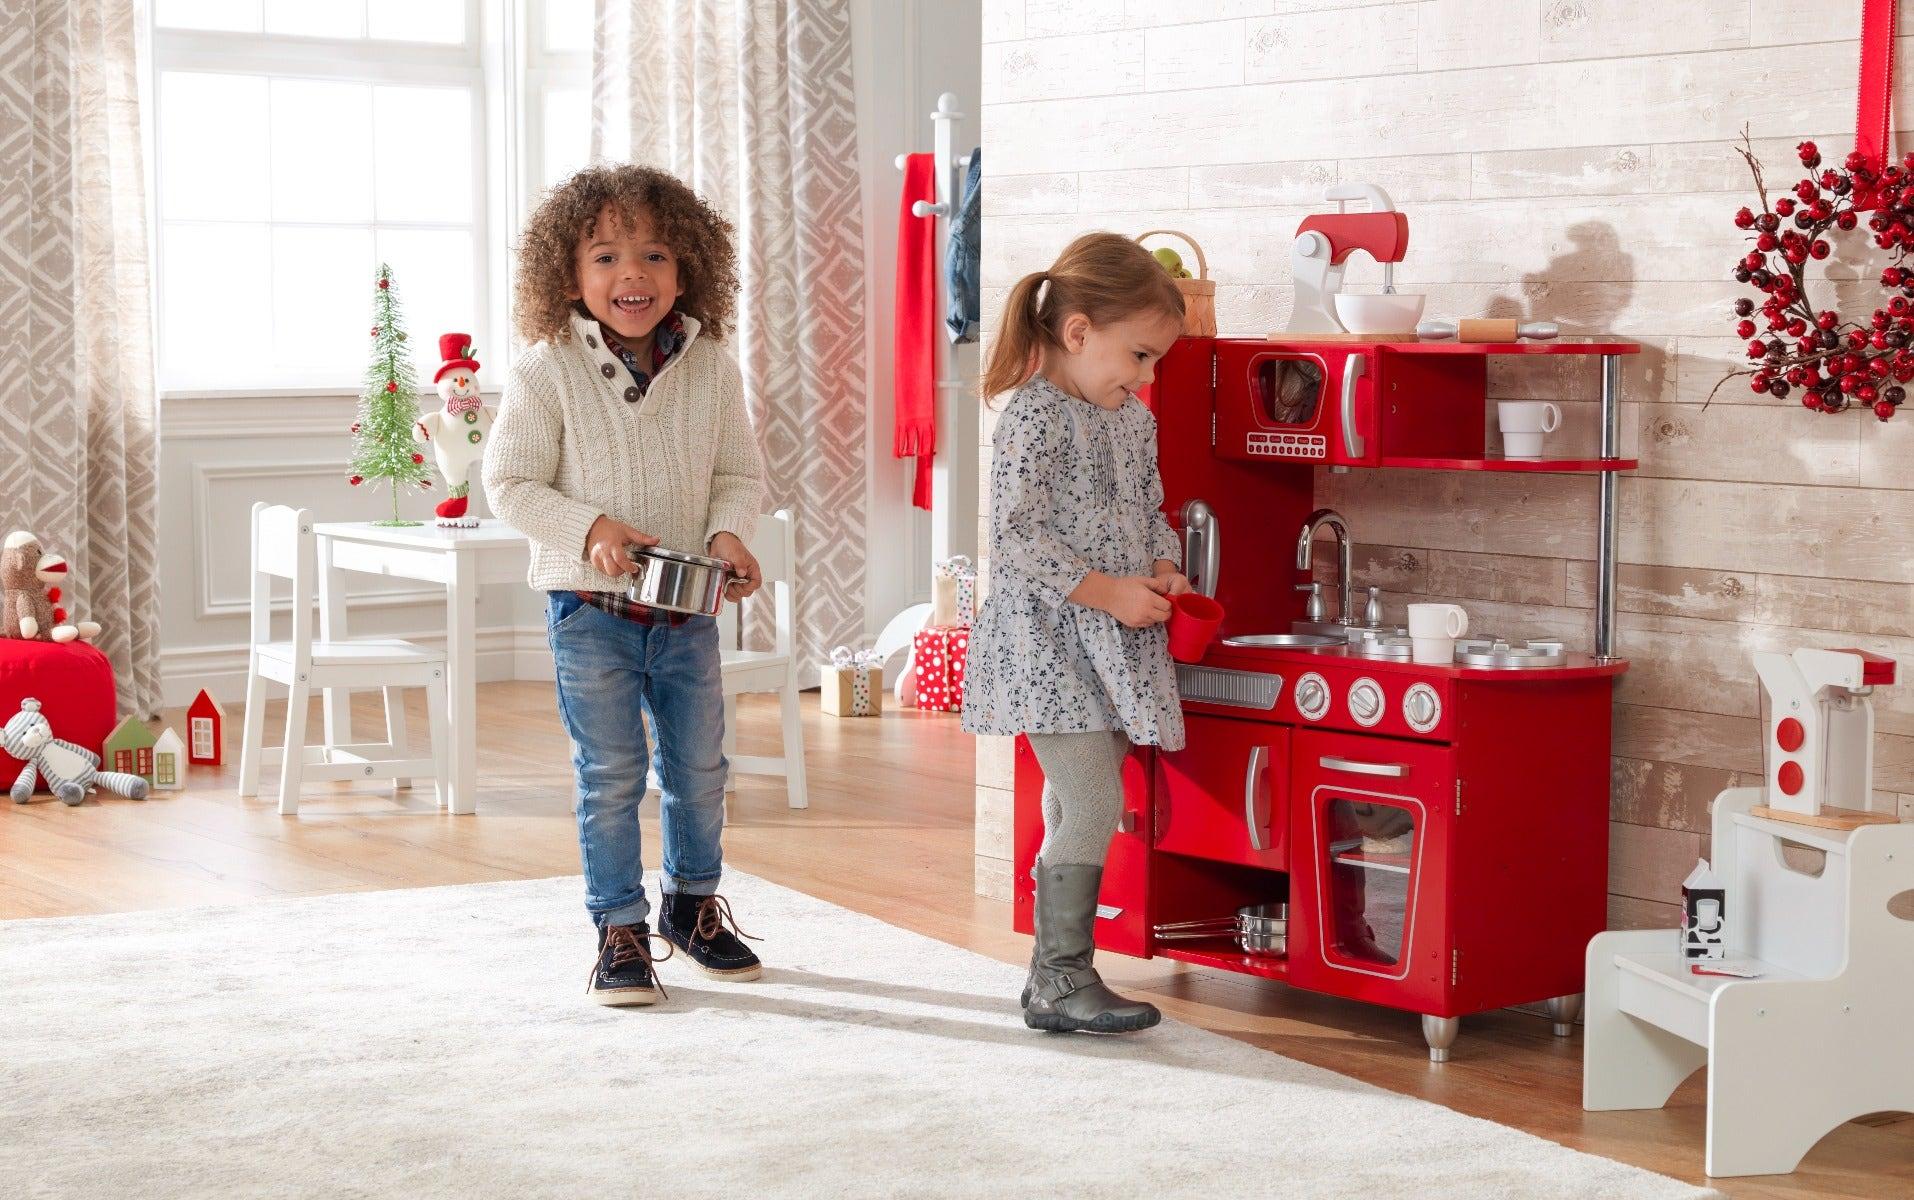 Kids Play Kitchen Baking Cookies